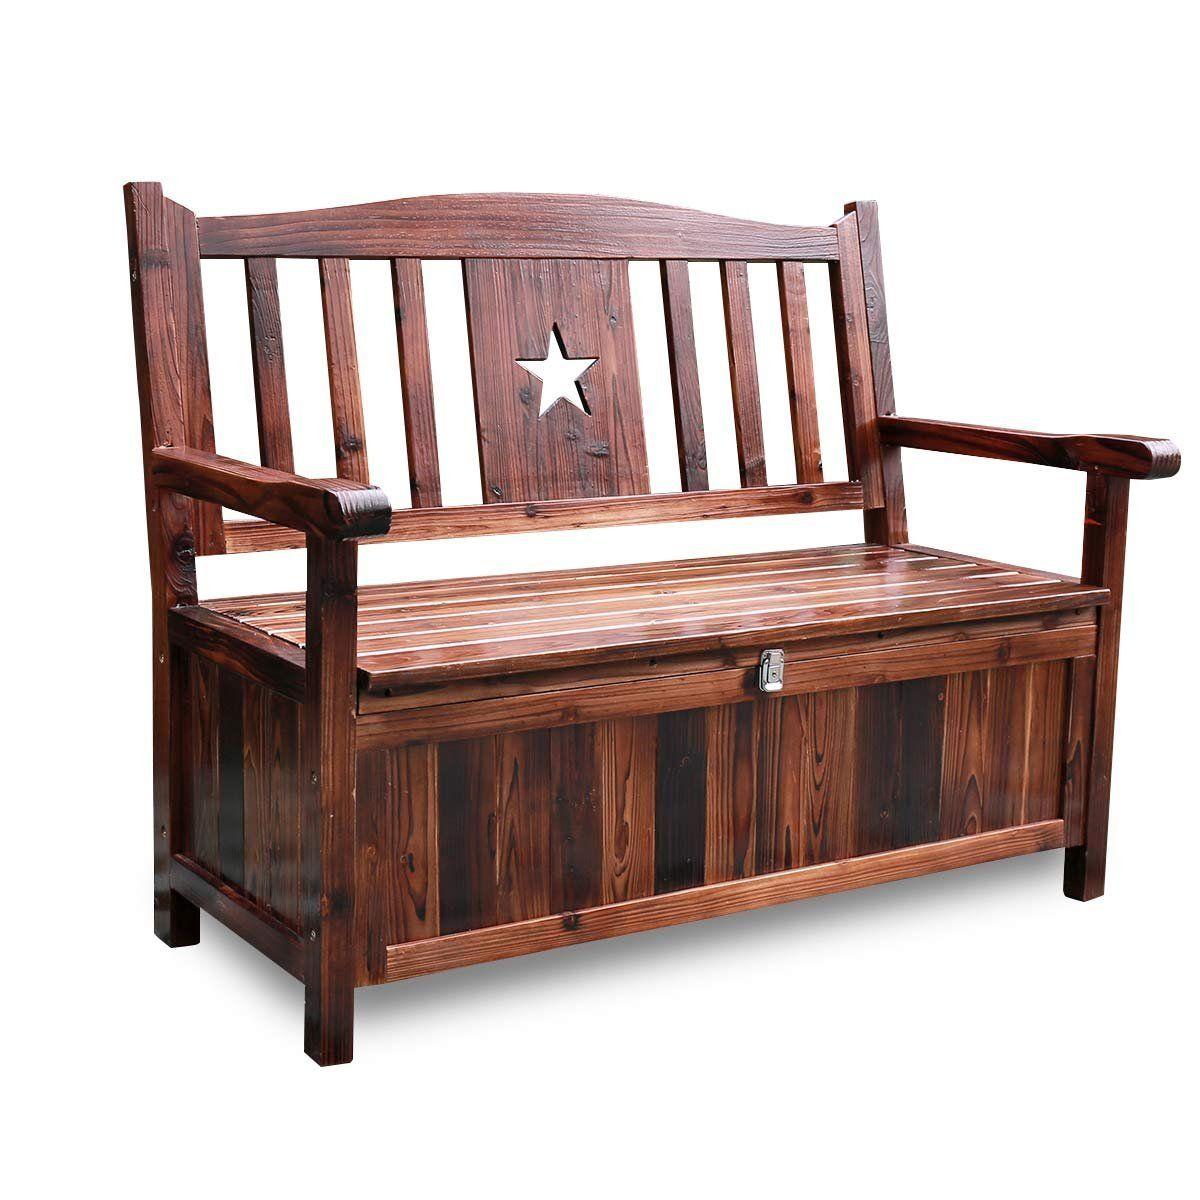 Amazon.com: Songsen Wooden Storage Bench With Arm And Back Garden Storage  Bench Chest Indoor Shoe Cabinet Chair: Kitchen U0026 Dining